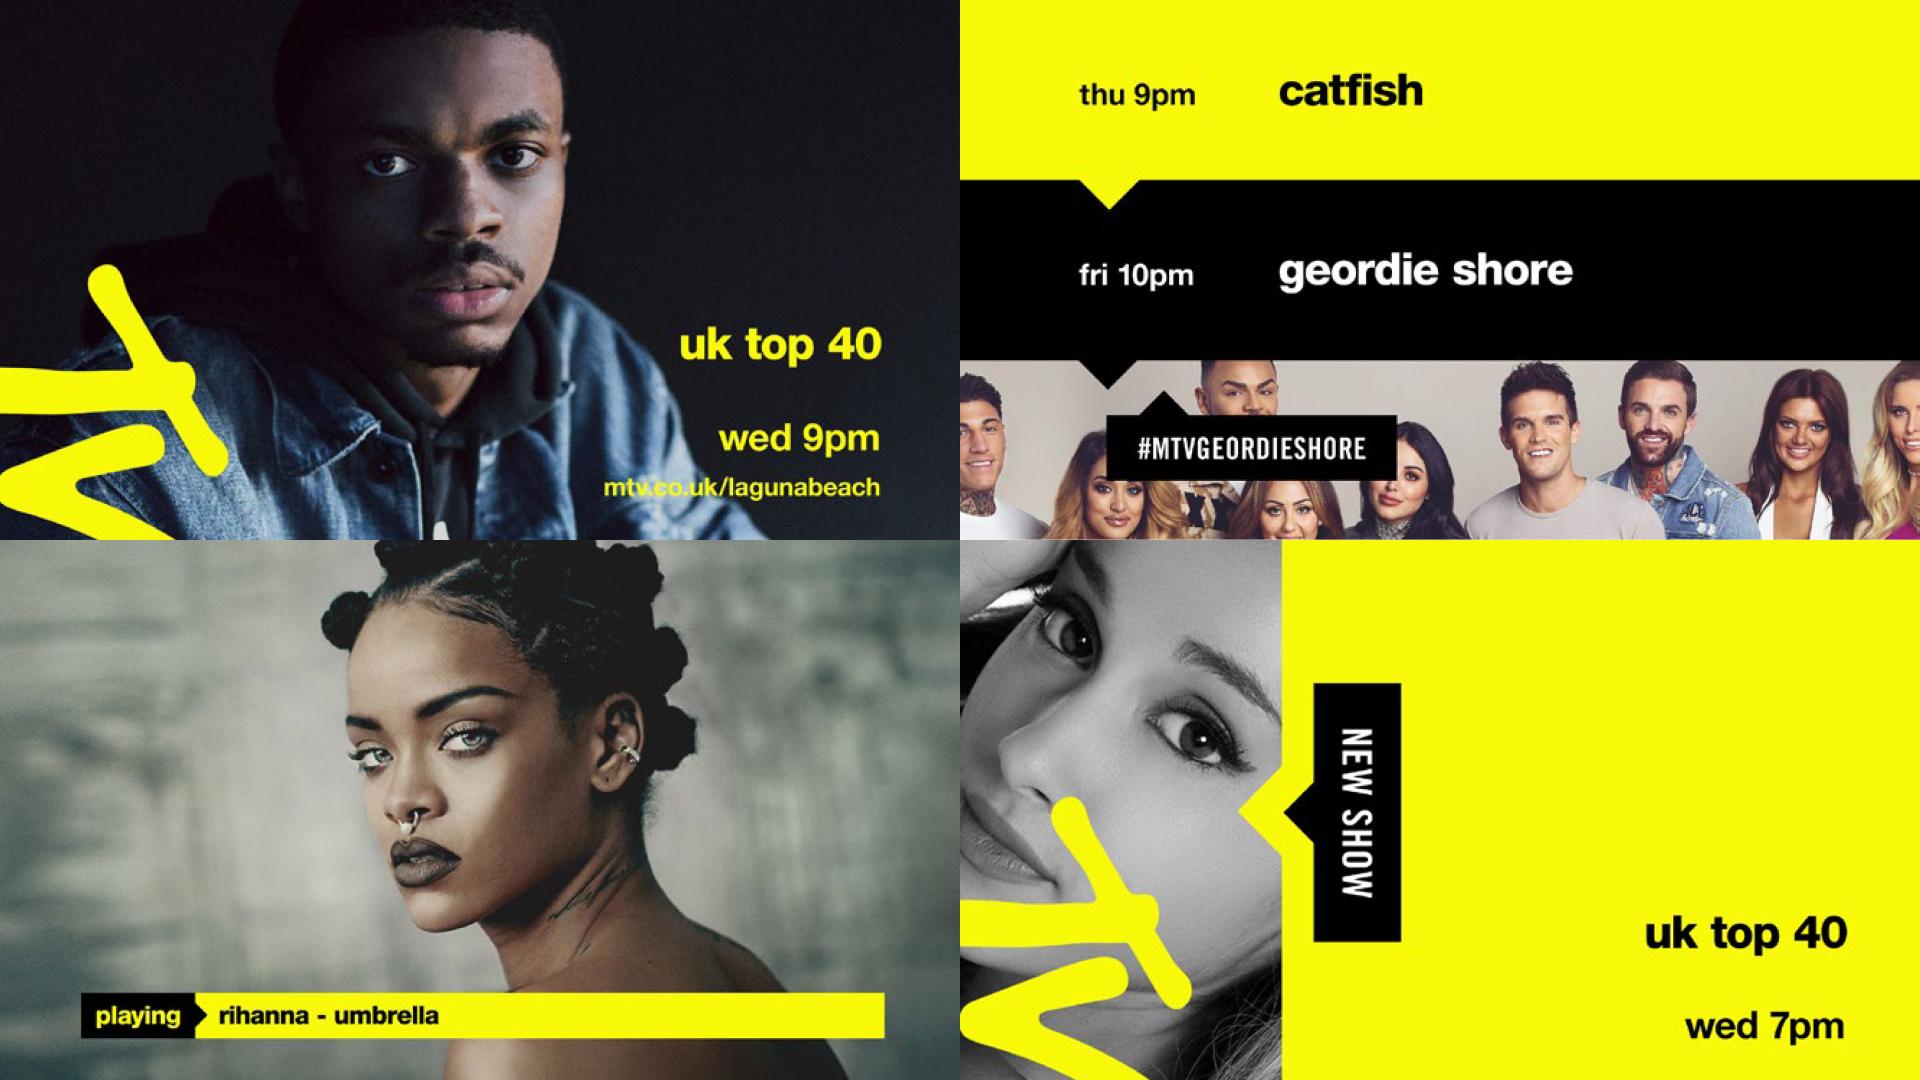 MTV_Multiplatform_04